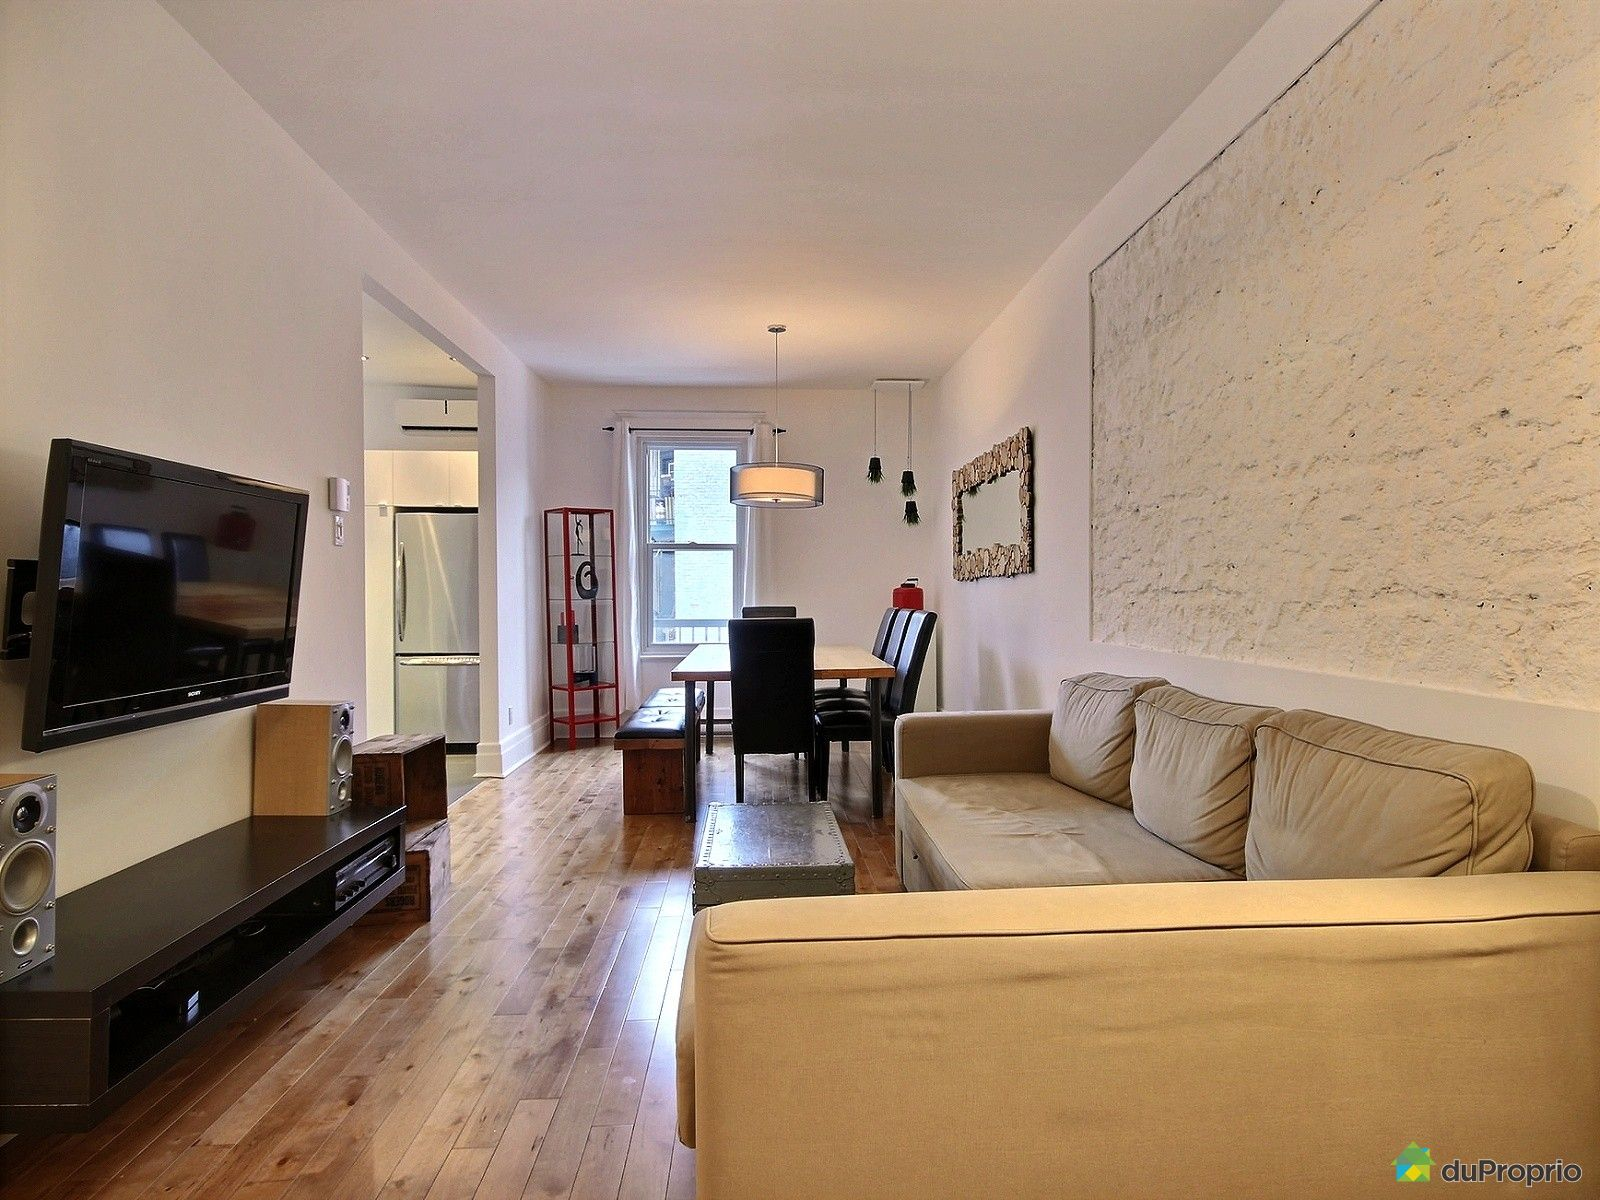 Condo Vendre Montr Al 5335 4e Avenue Immobilier Qu Bec